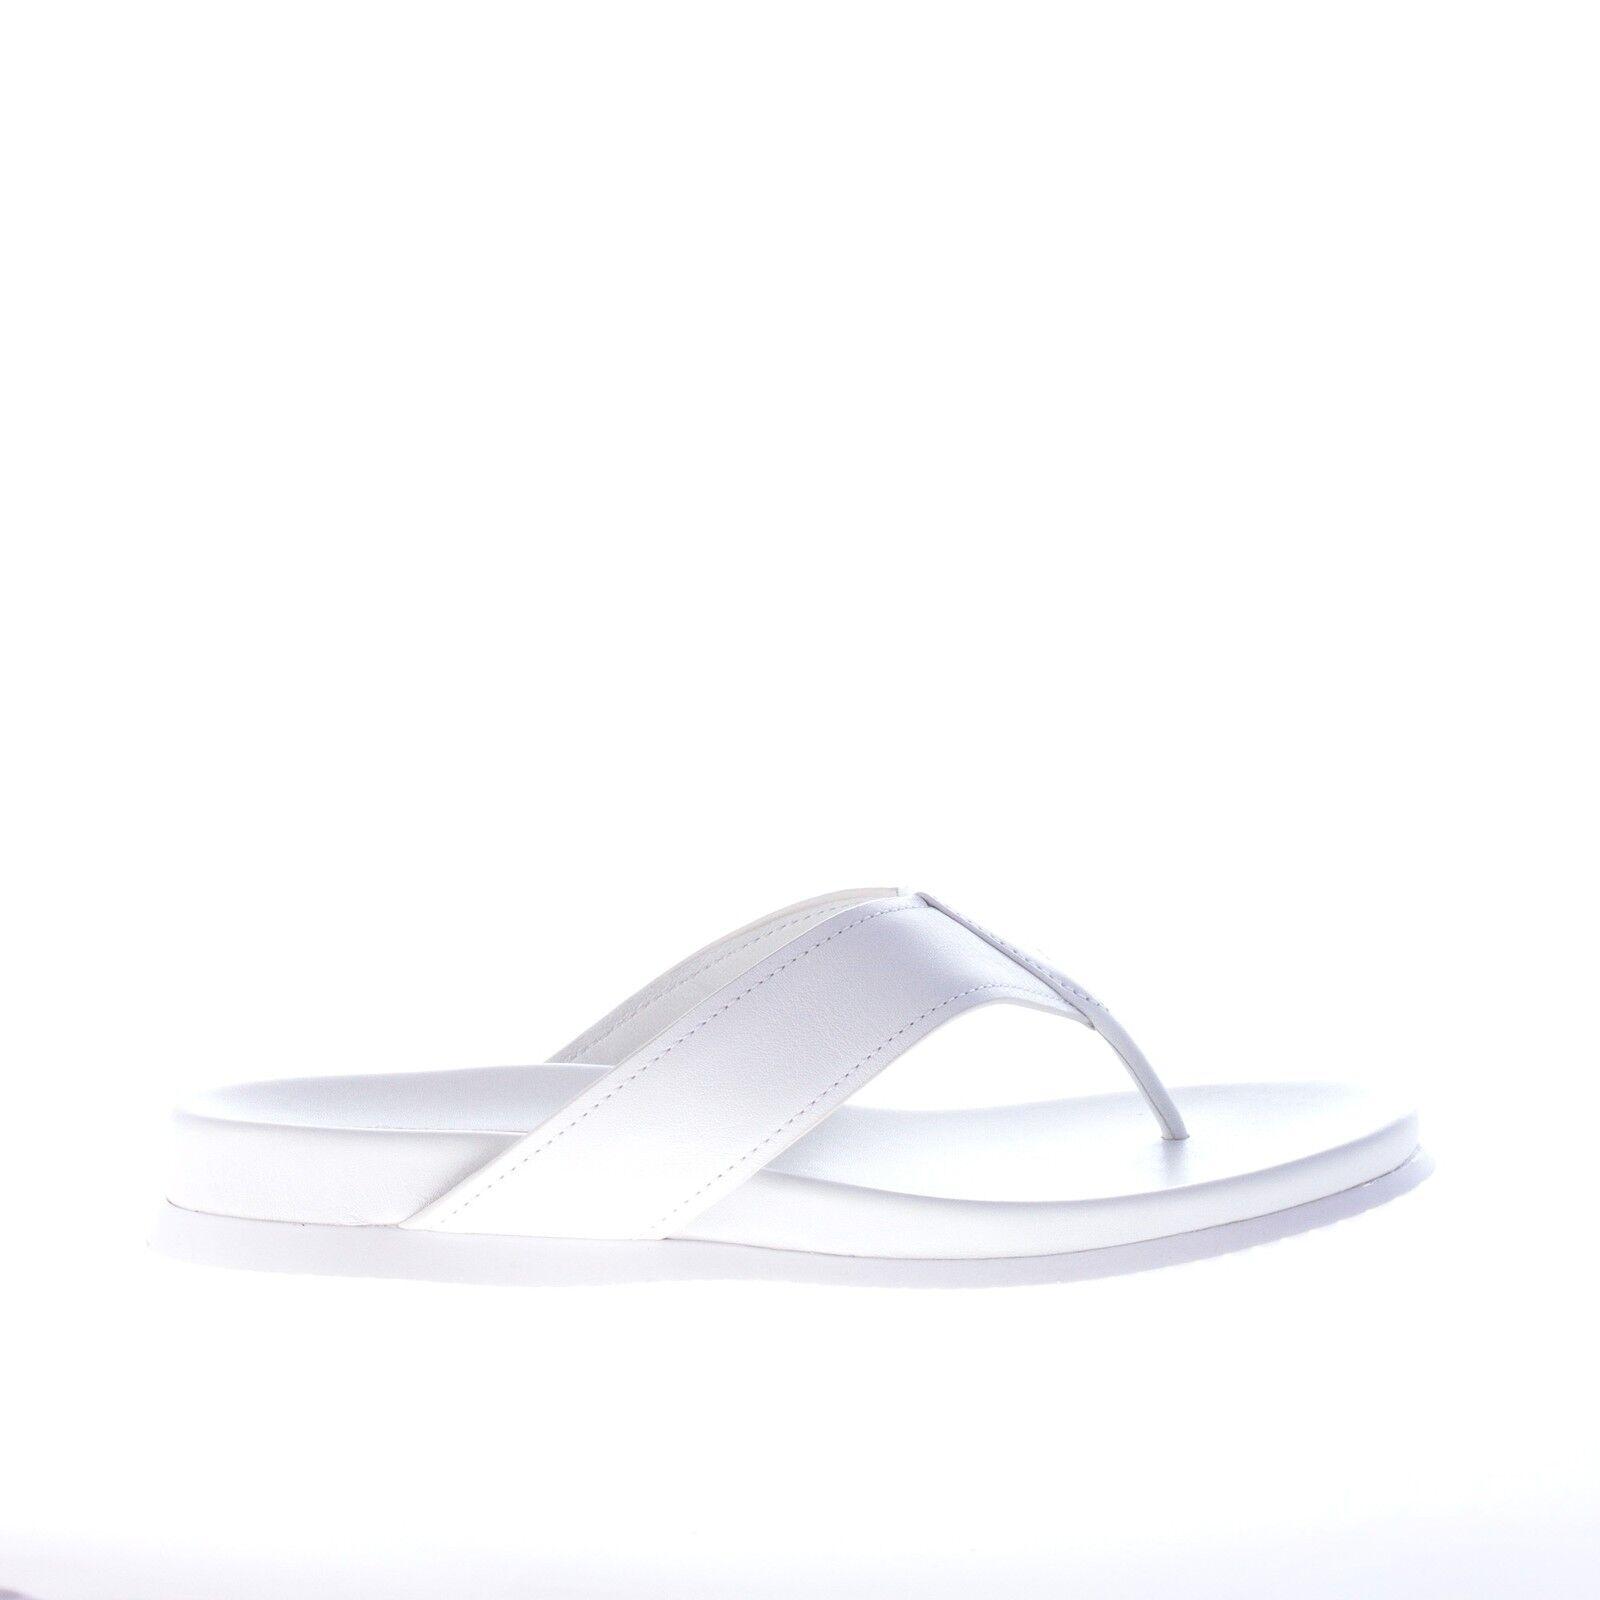 PRADA scarpe donna Donna shoes pelle sandalo slide infradito in pelle shoes BIANCO c79a89